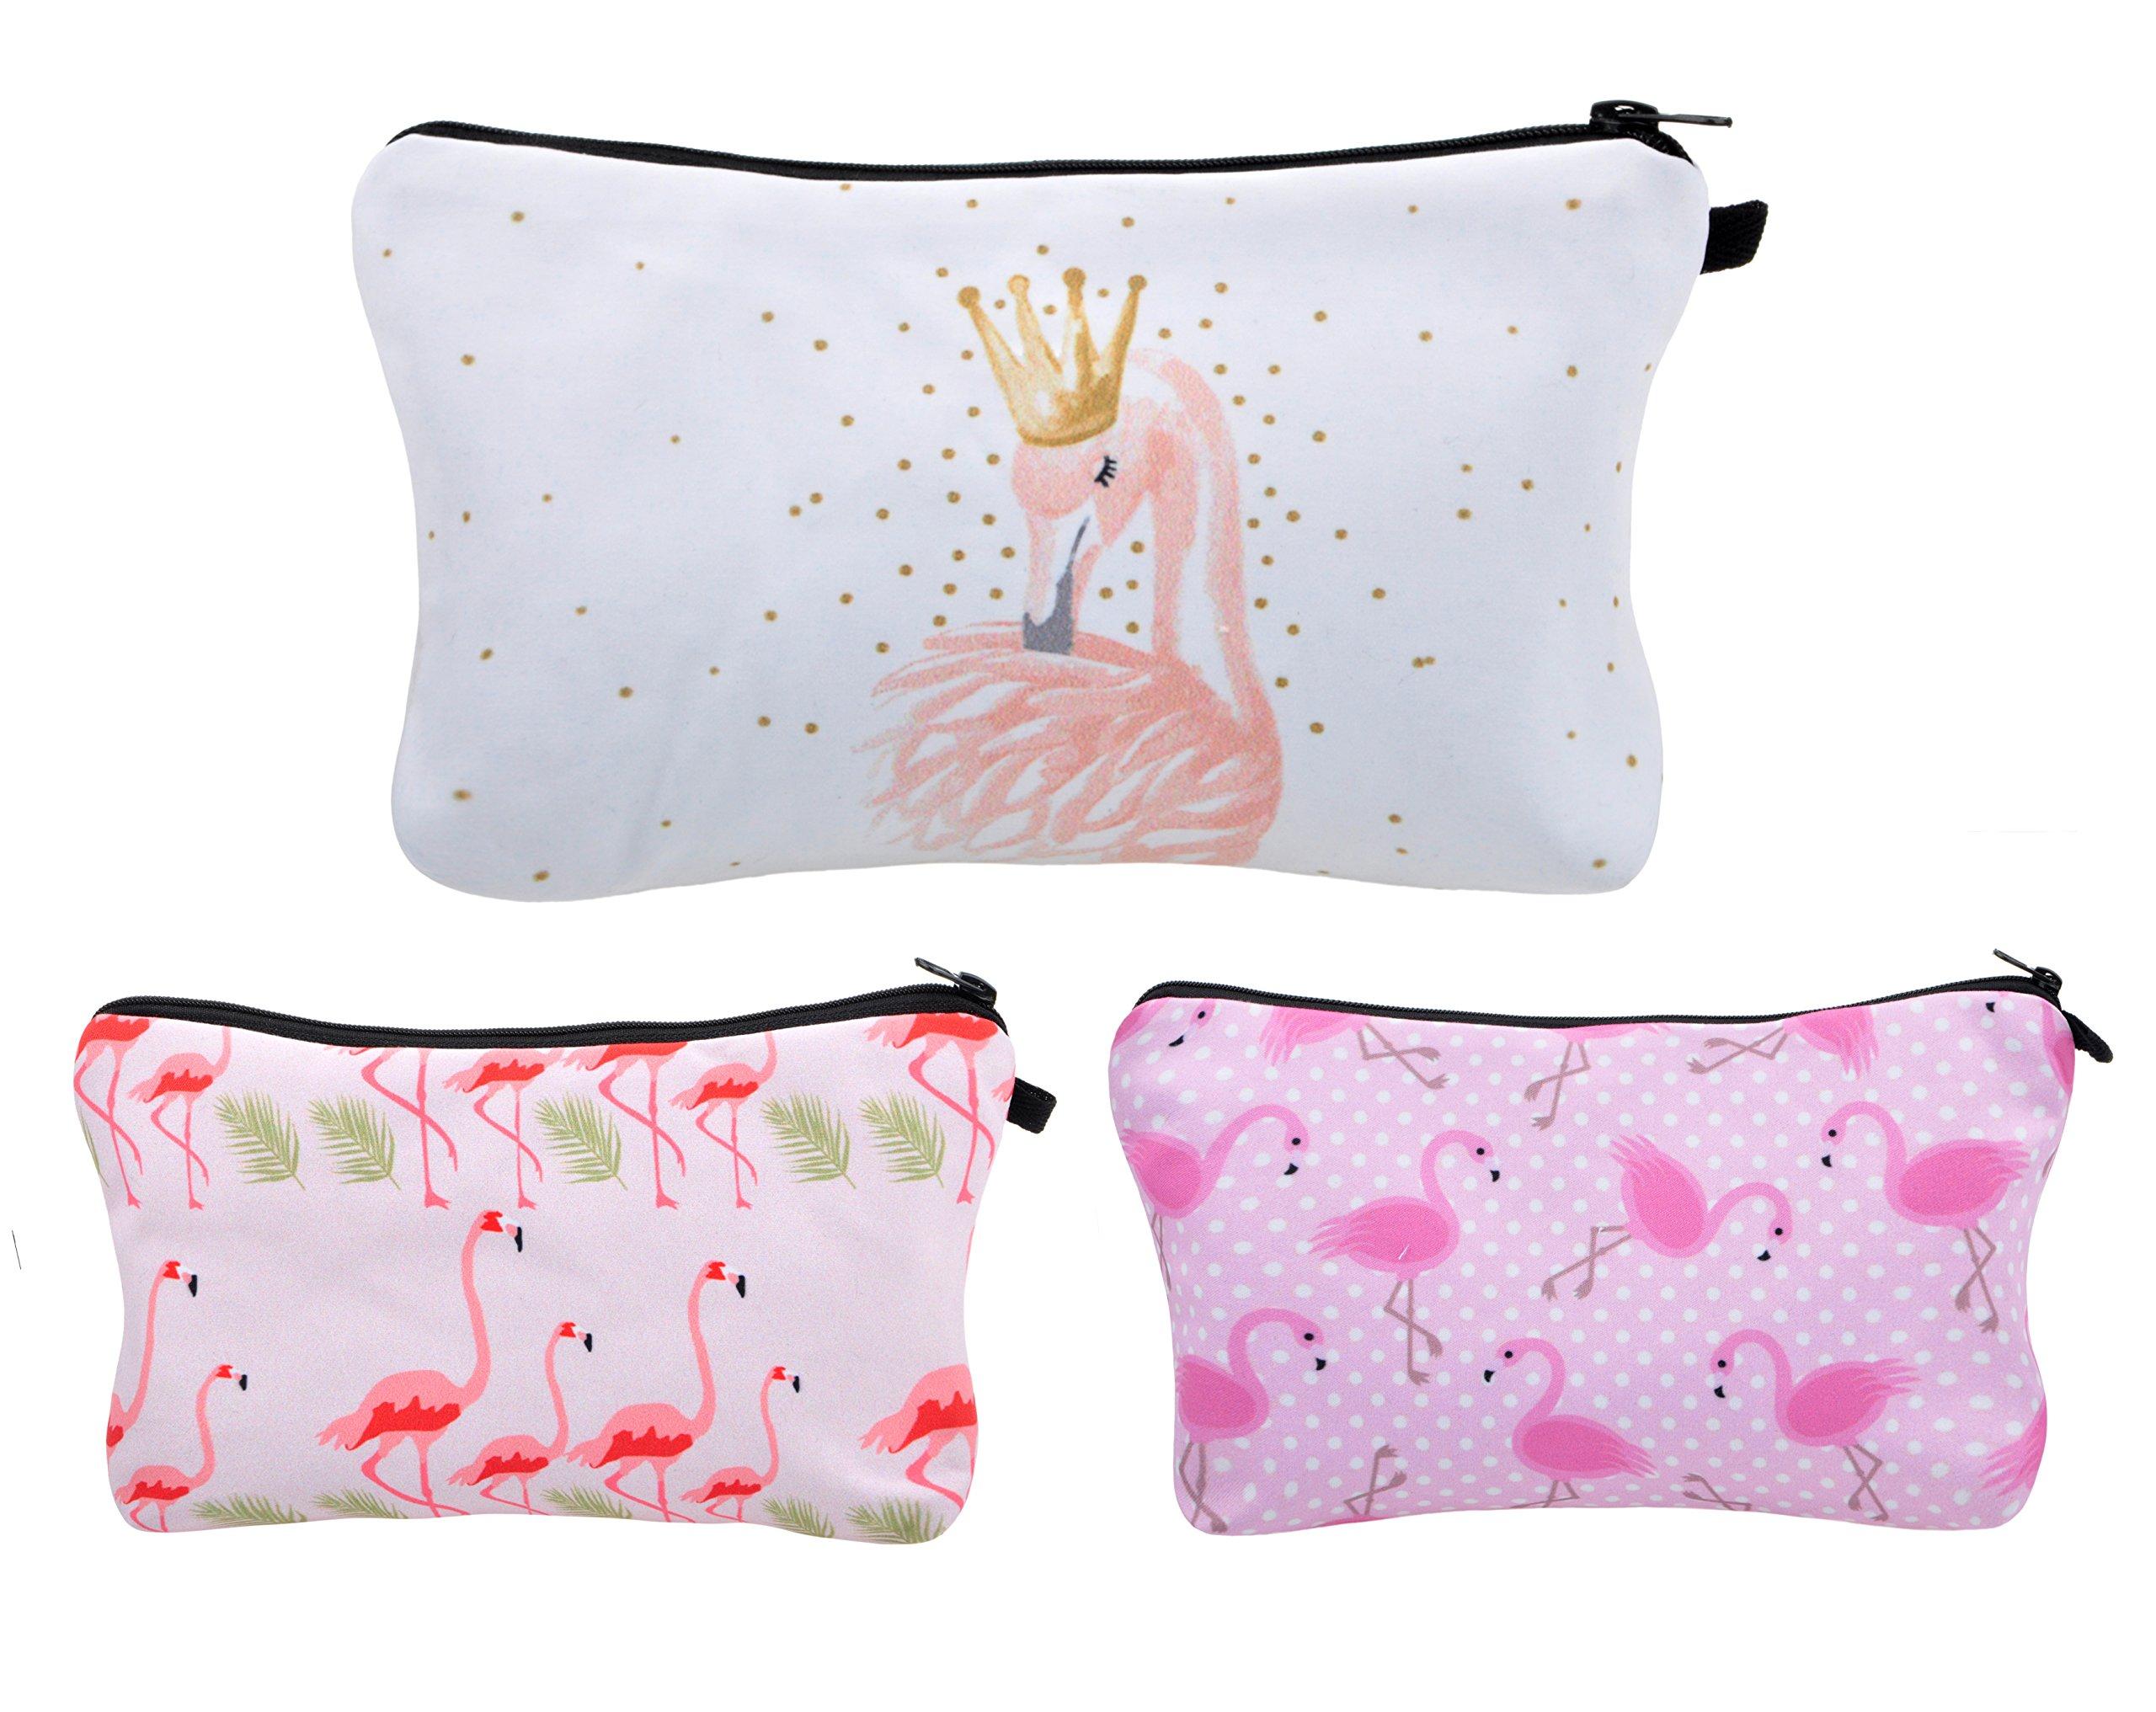 Vercord 3pcs Unicorn Makeup Bag Funny 3D Printing Women Travel Portable Cosmetic Bag Pouch Makeup Holder Organizer, Flamingo